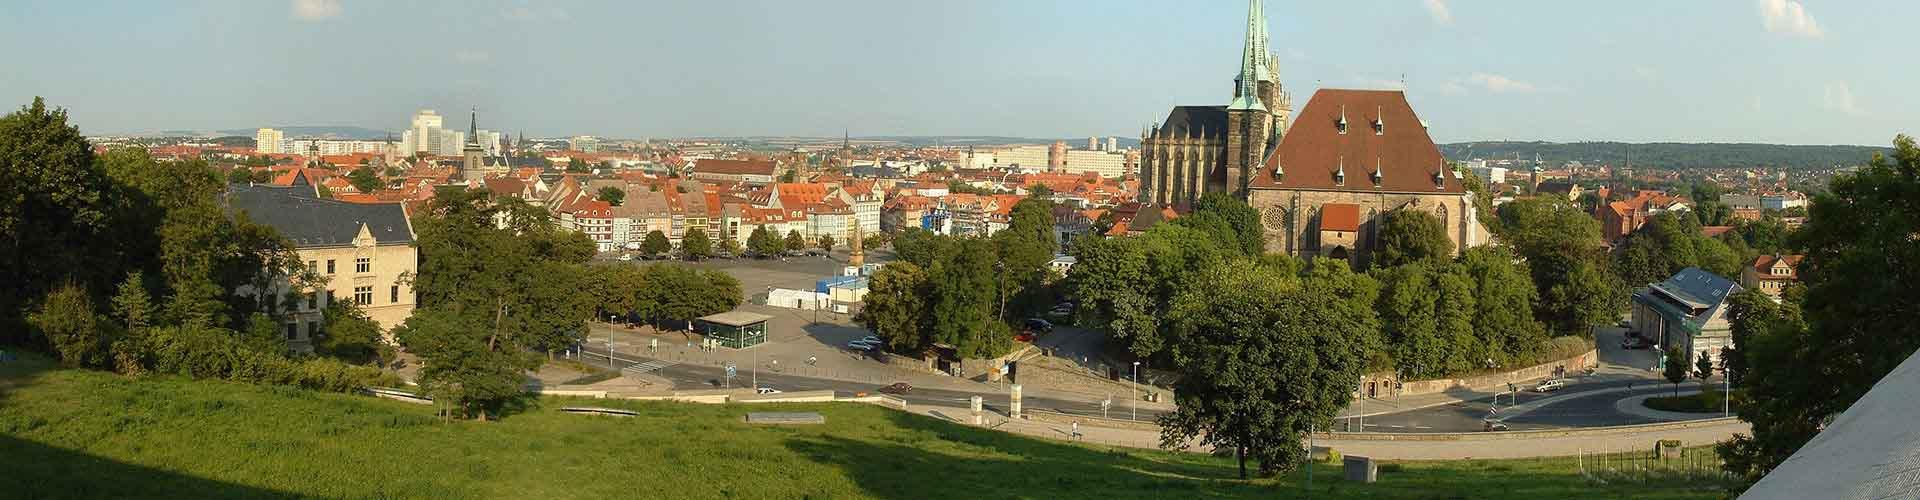 Erfurt - Hoteles baratos en Erfurt. Mapas de Erfurt, Fotos y Comentarios para cada alojamiento en Erfurt.